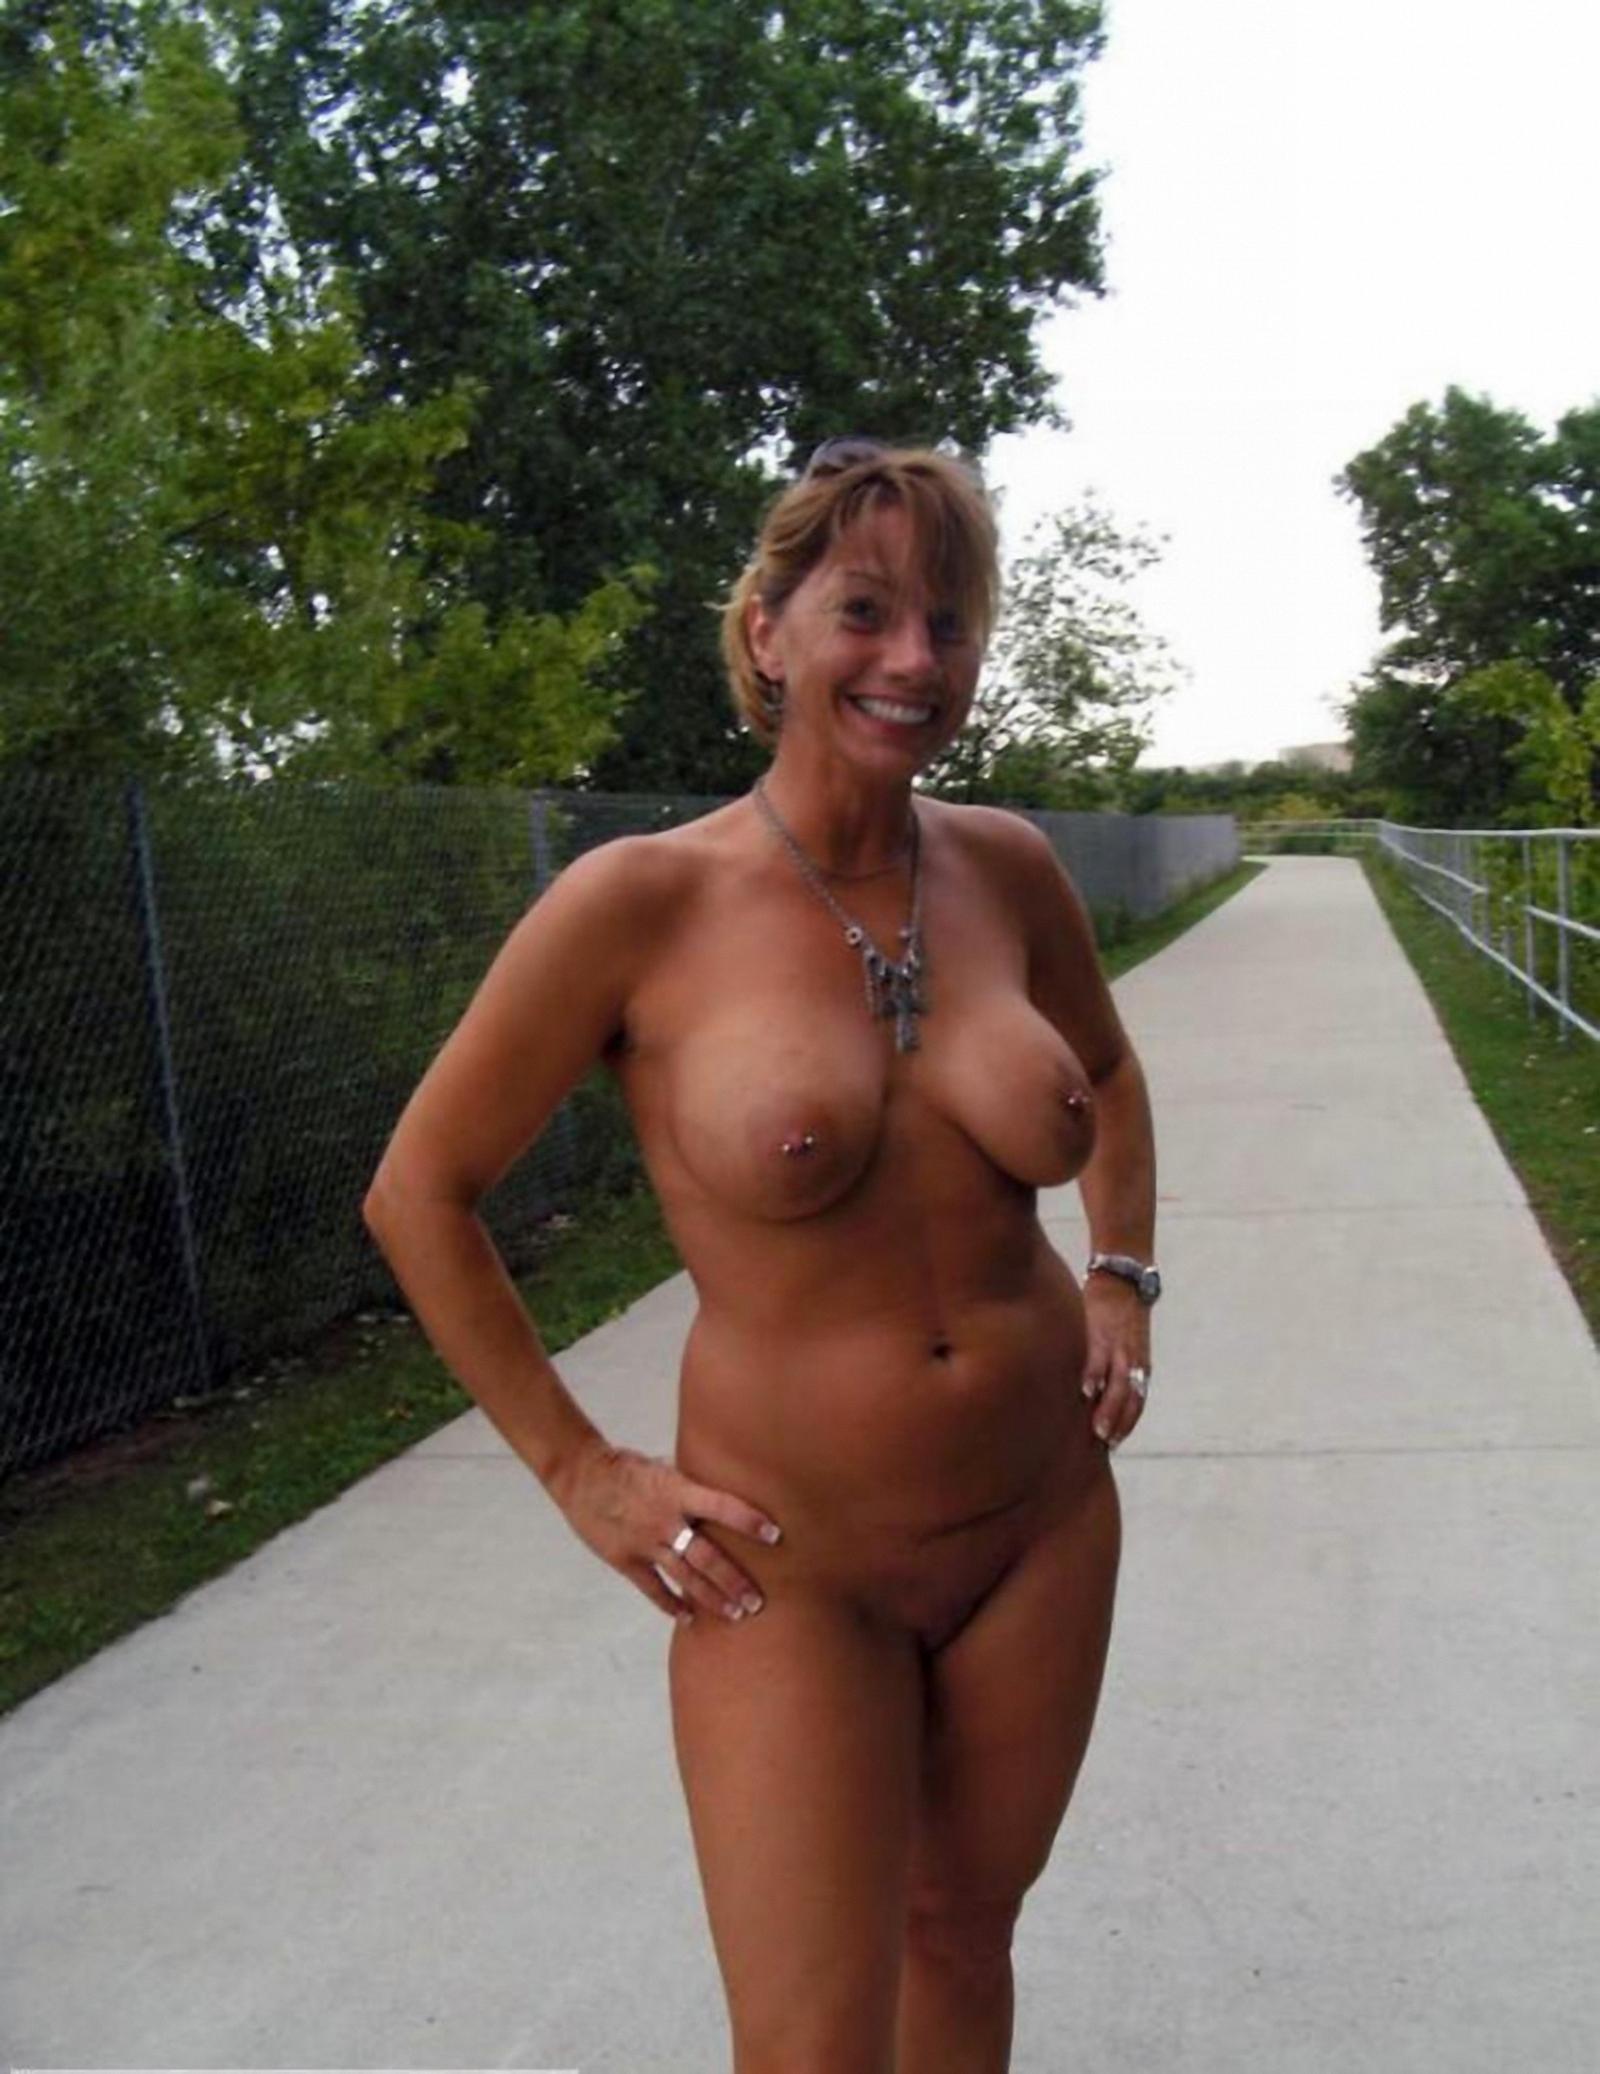 Henita nude images hentai pictures